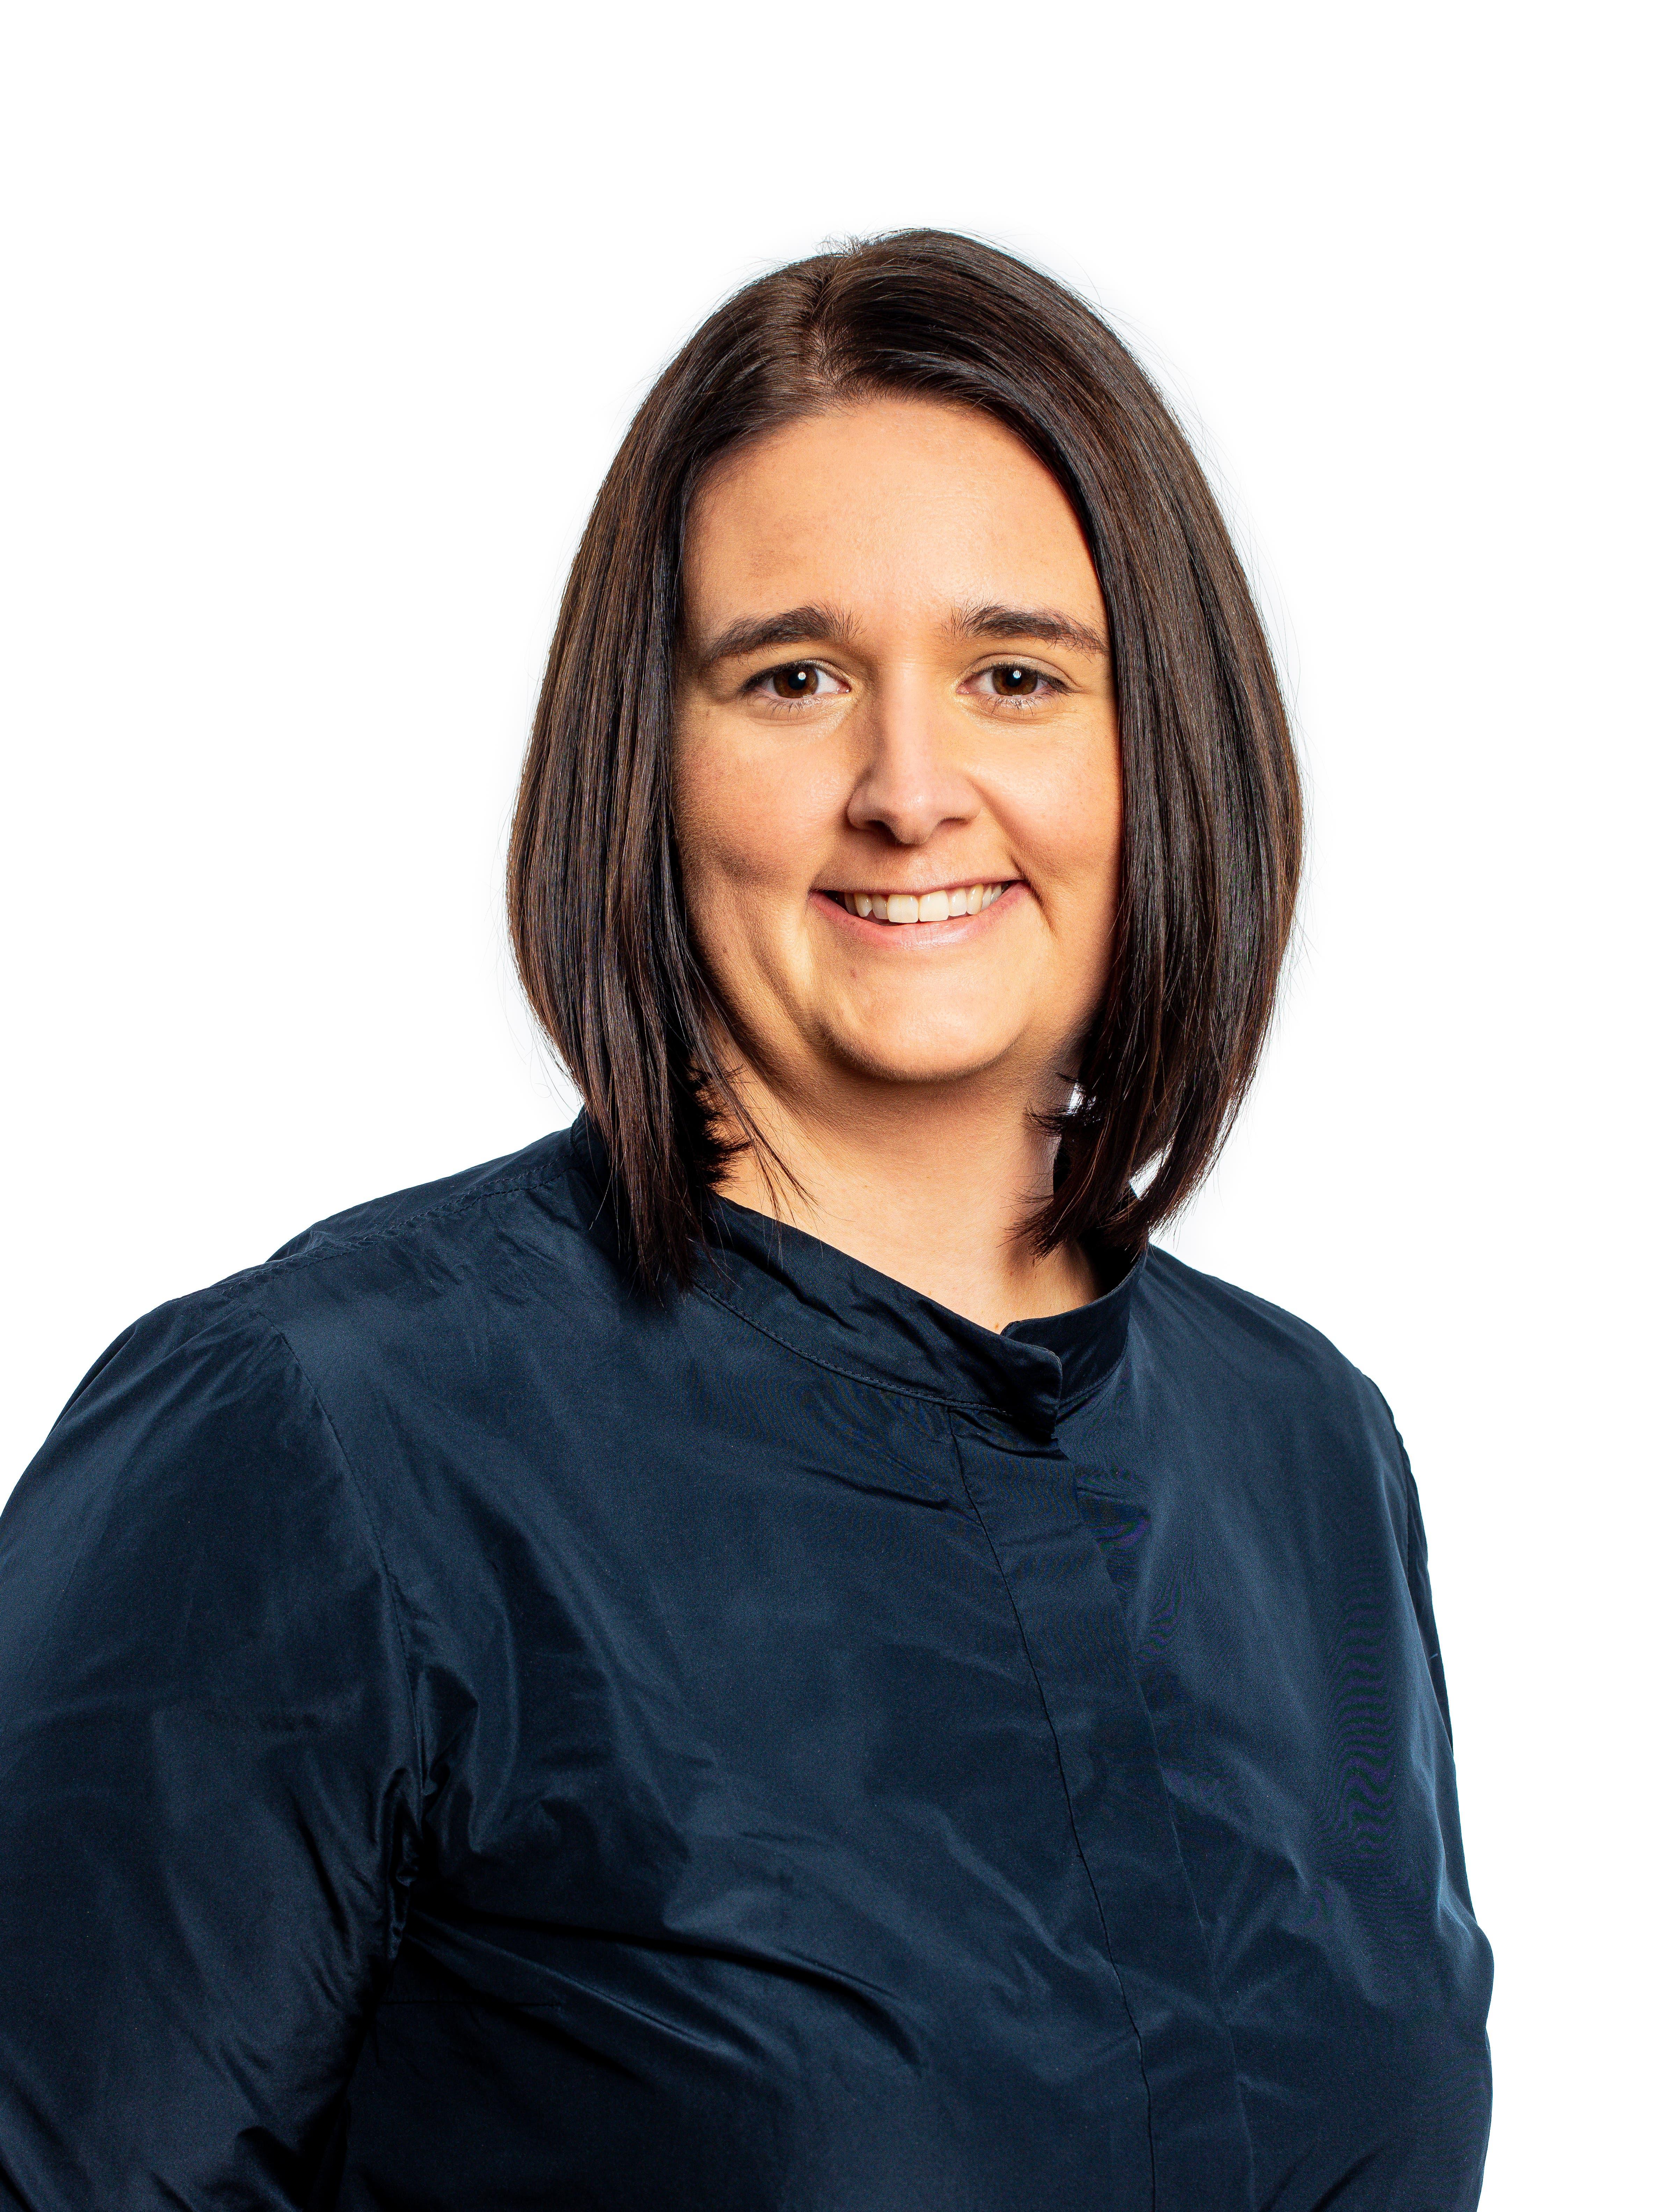 Gewählt: Ramona Gut-Rogger, FDP (bisher)